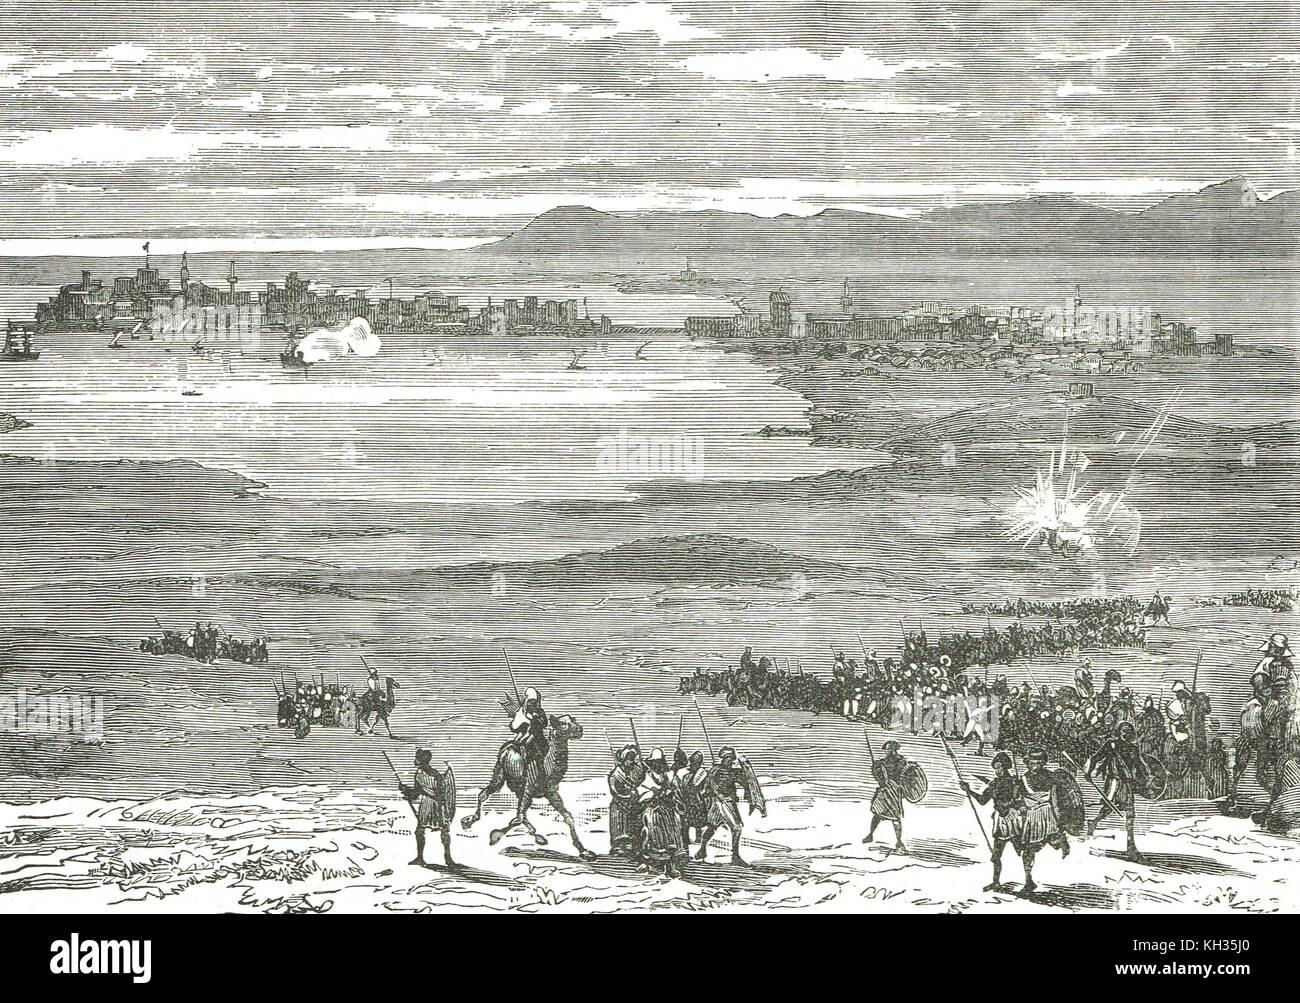 British war ship firing on rebels, Suakin, 1884, siege of Suakin, Sudan war - Stock Image